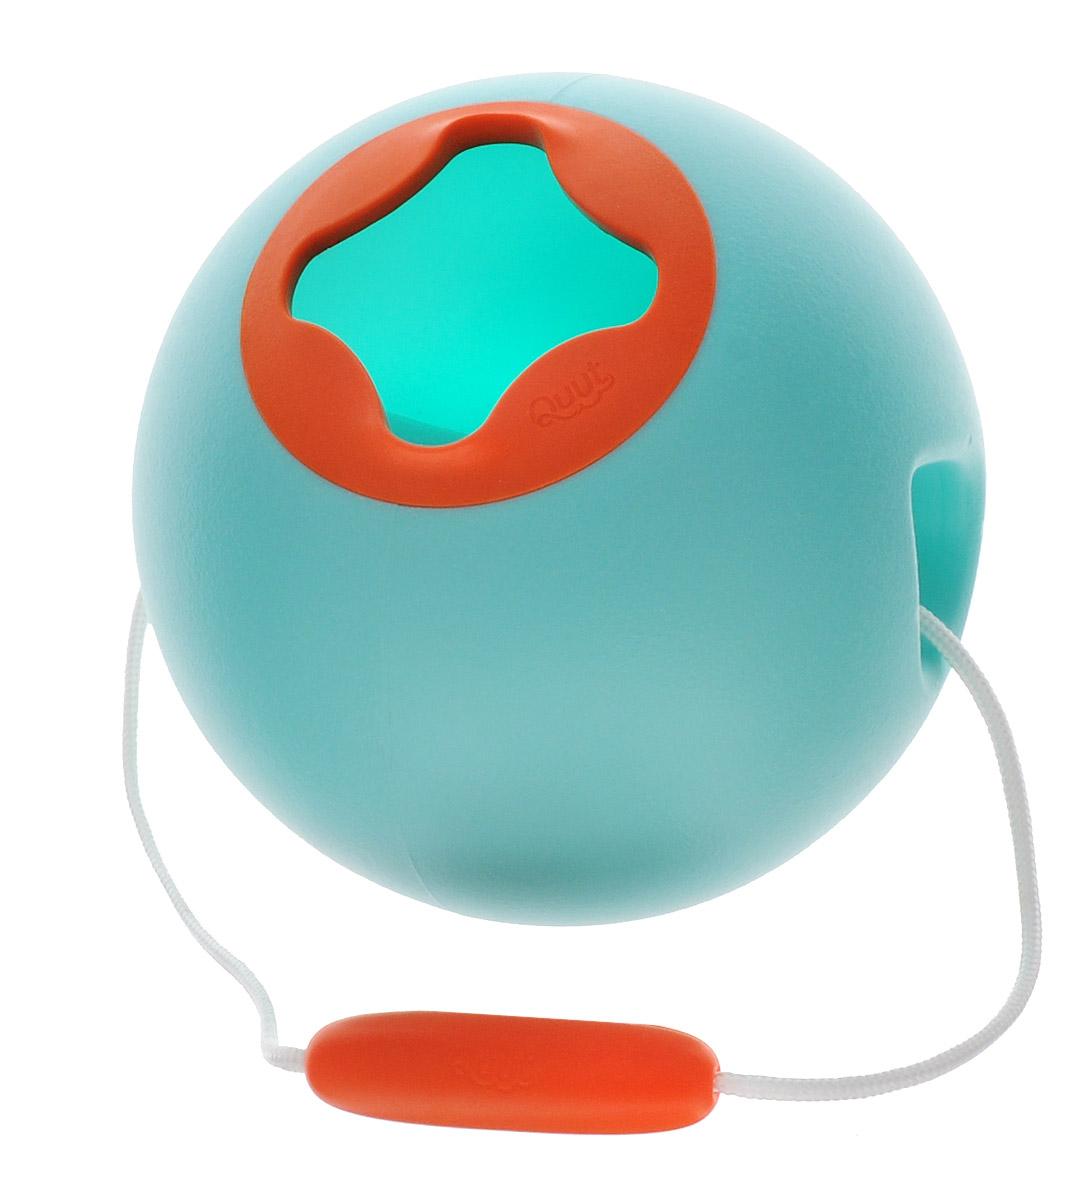 Quut Ведерко для воды Ballo цвет голубой xerox 106r03581 black тонер картридж для xerox versalink b400 versalink b405